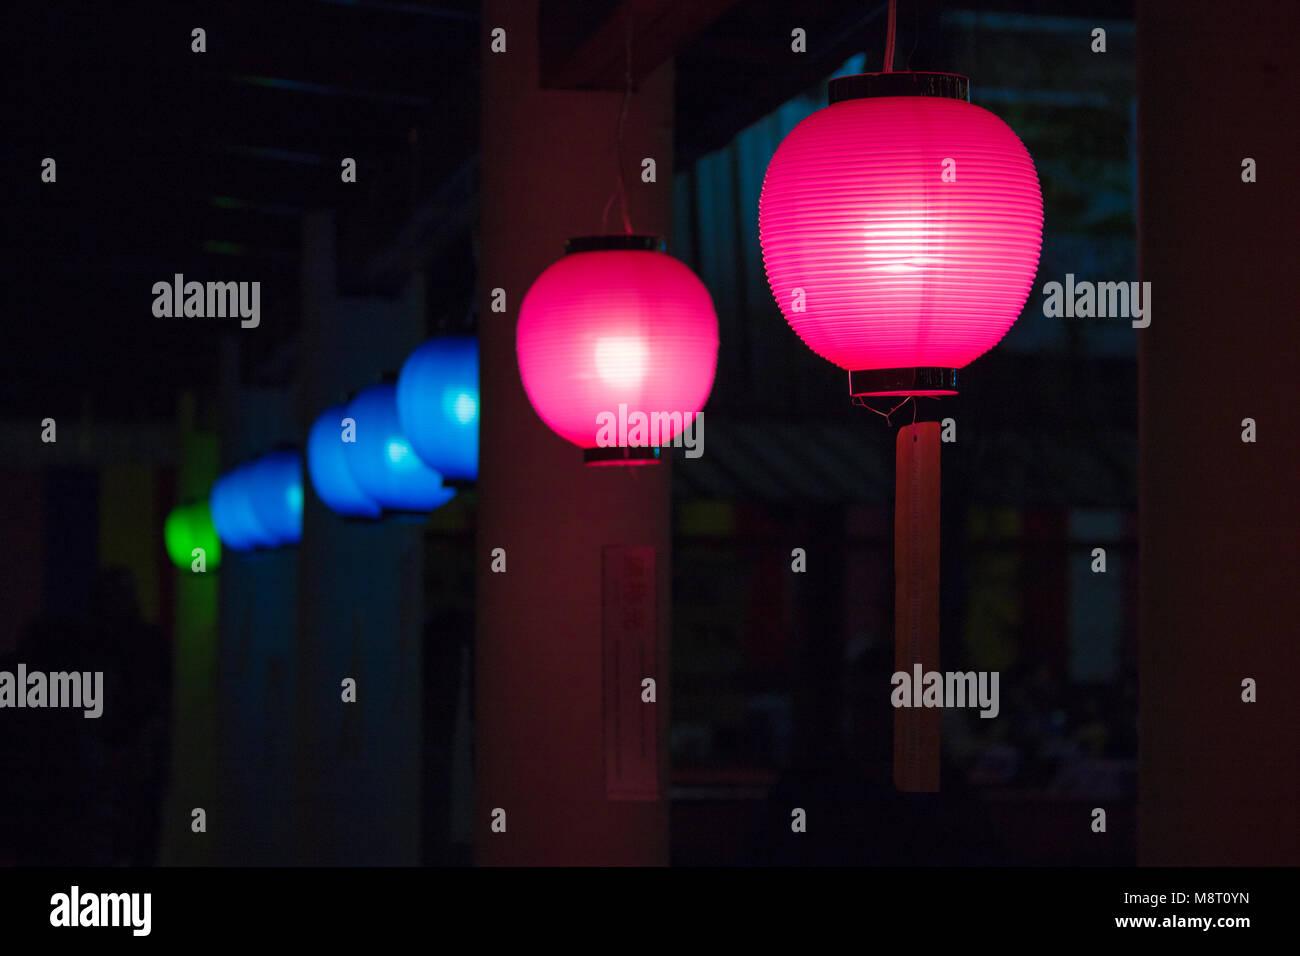 Coloured Japanese lanterns, also known as Chōchin (提灯). Stock Photo